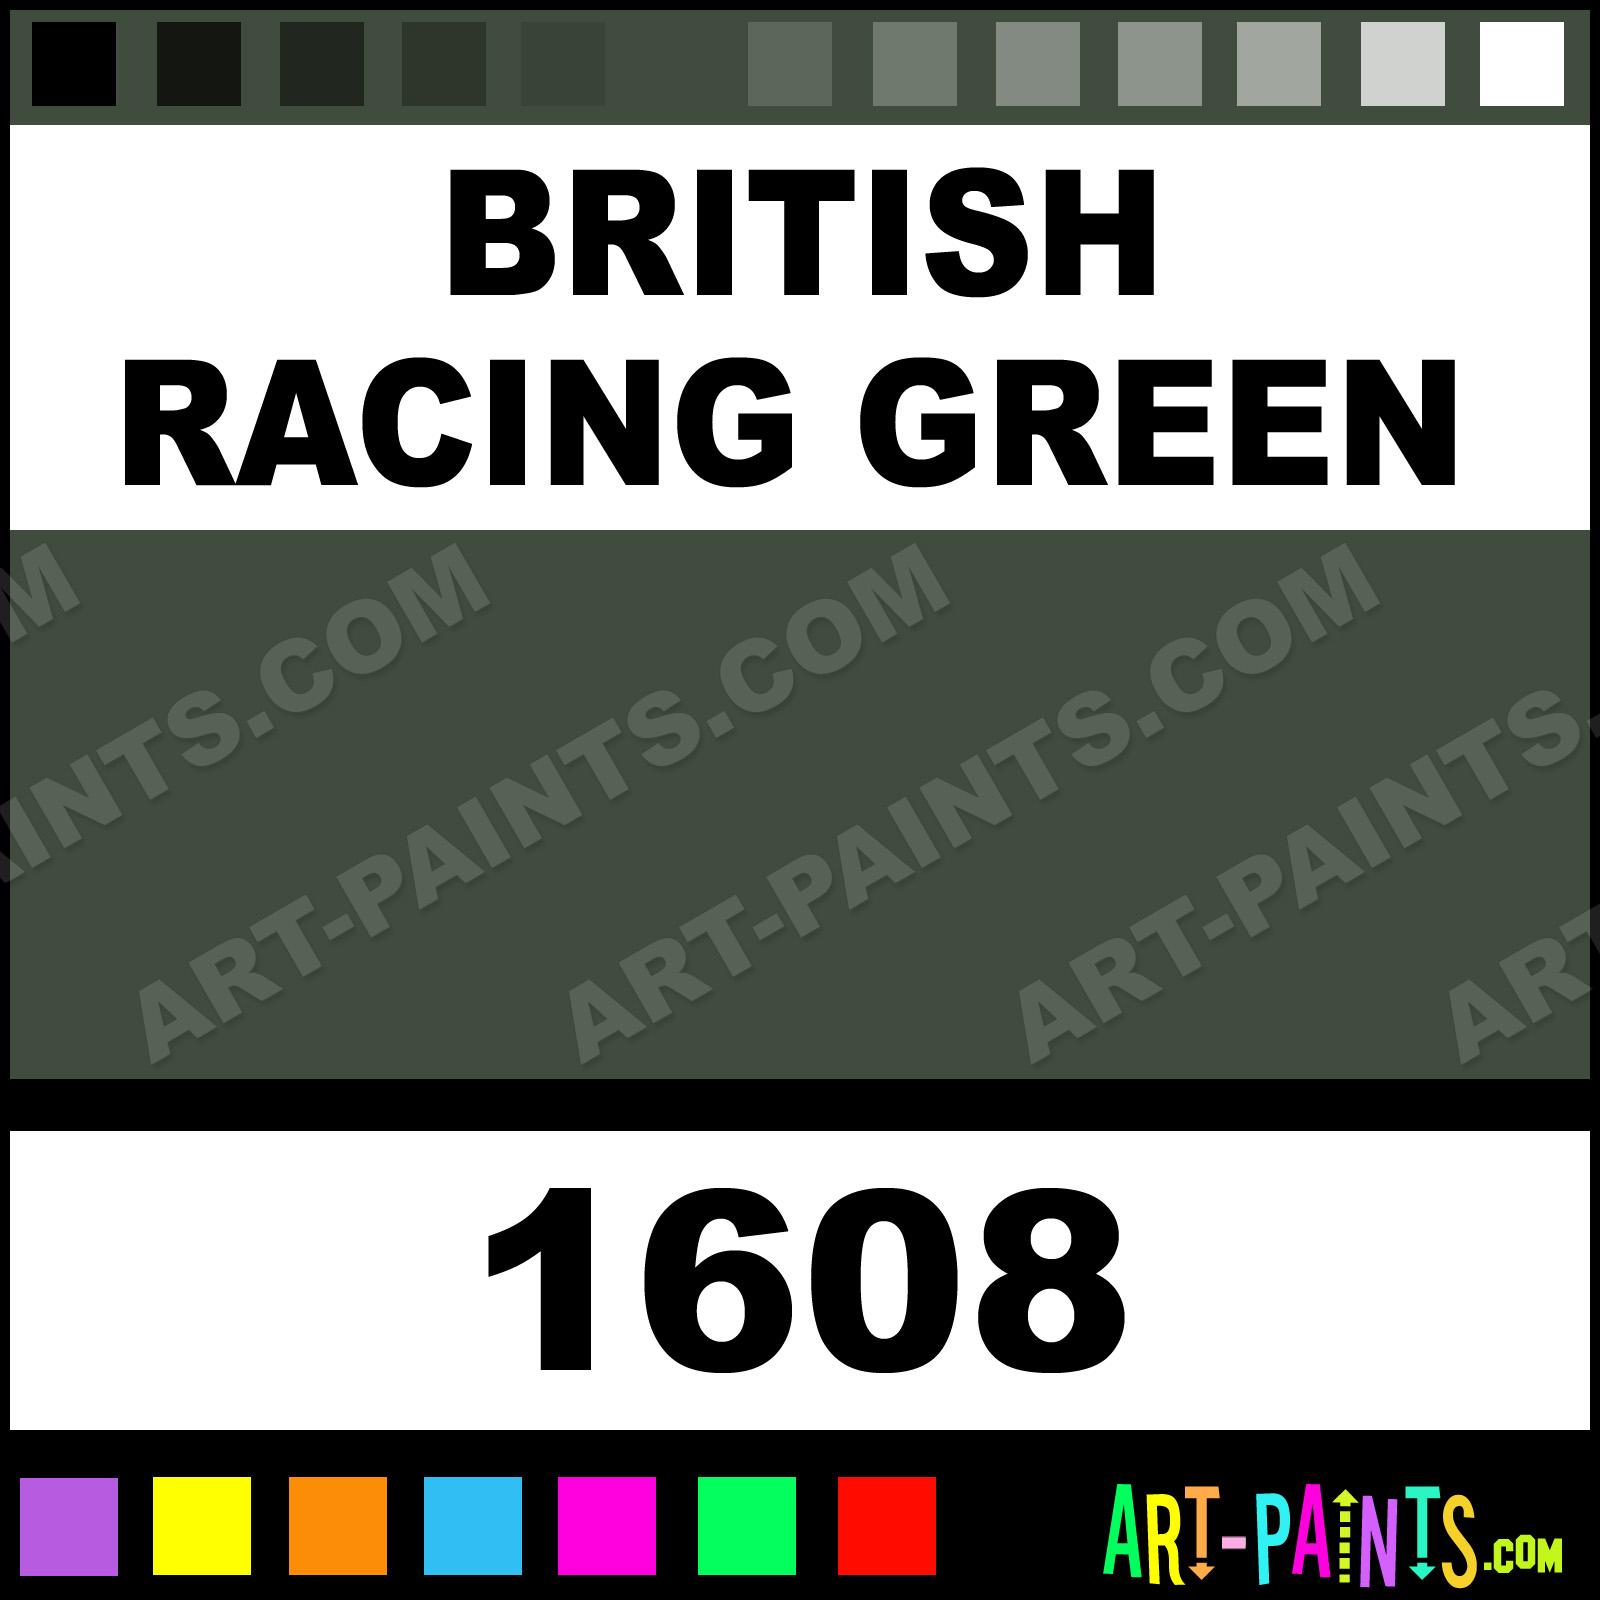 Acrylic Enamel Paint >> British Racing Green Acrylic Enamel Paints - 1608 - British Racing Green Paint, British Racing ...